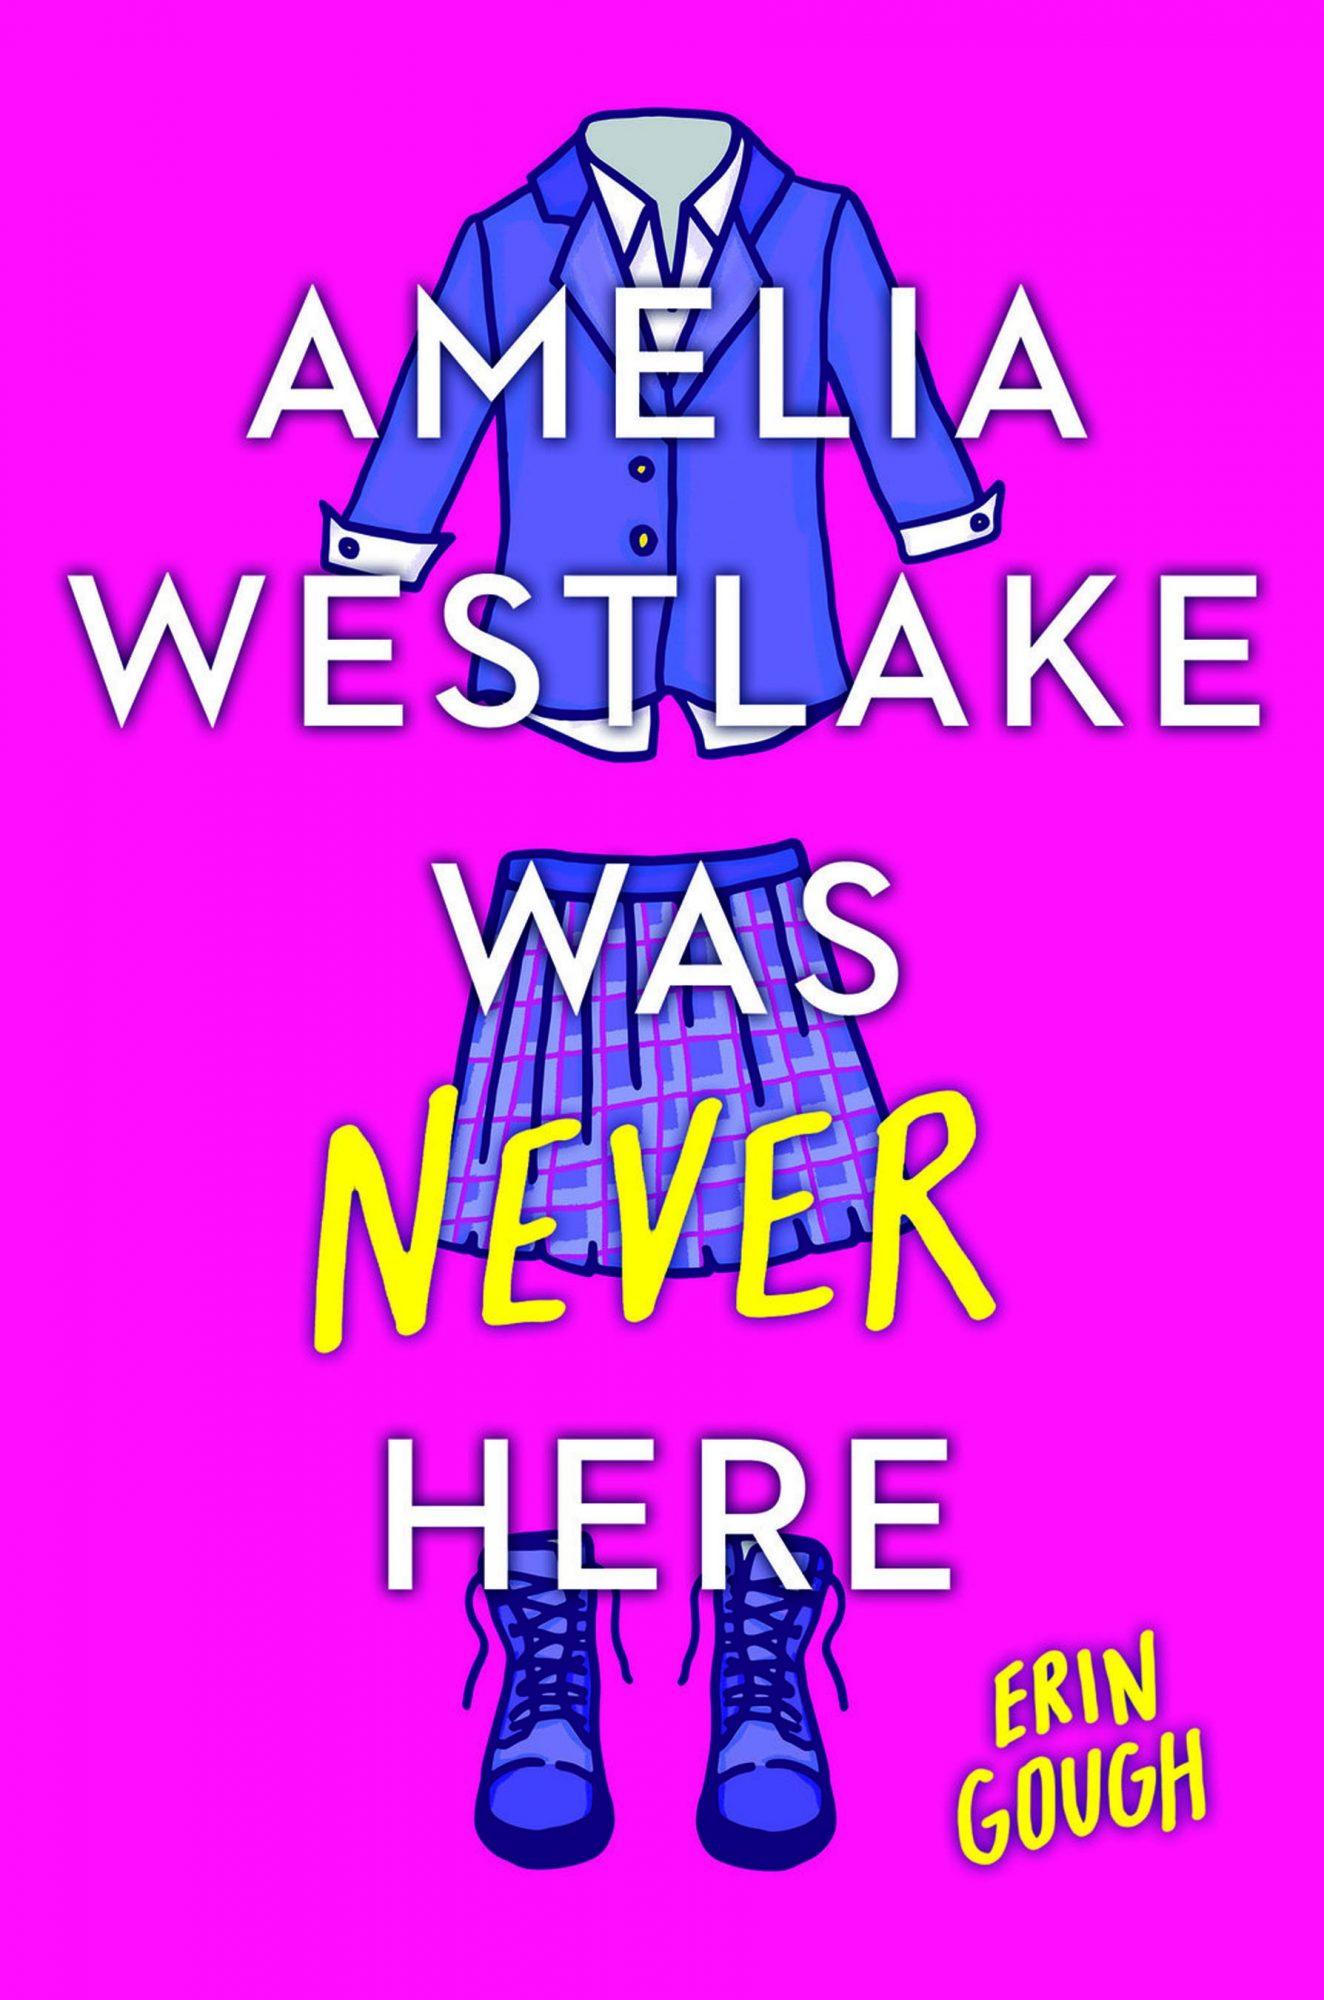 Amelia Westlake Was Never Here by Erin GoughPublisher: Poppy